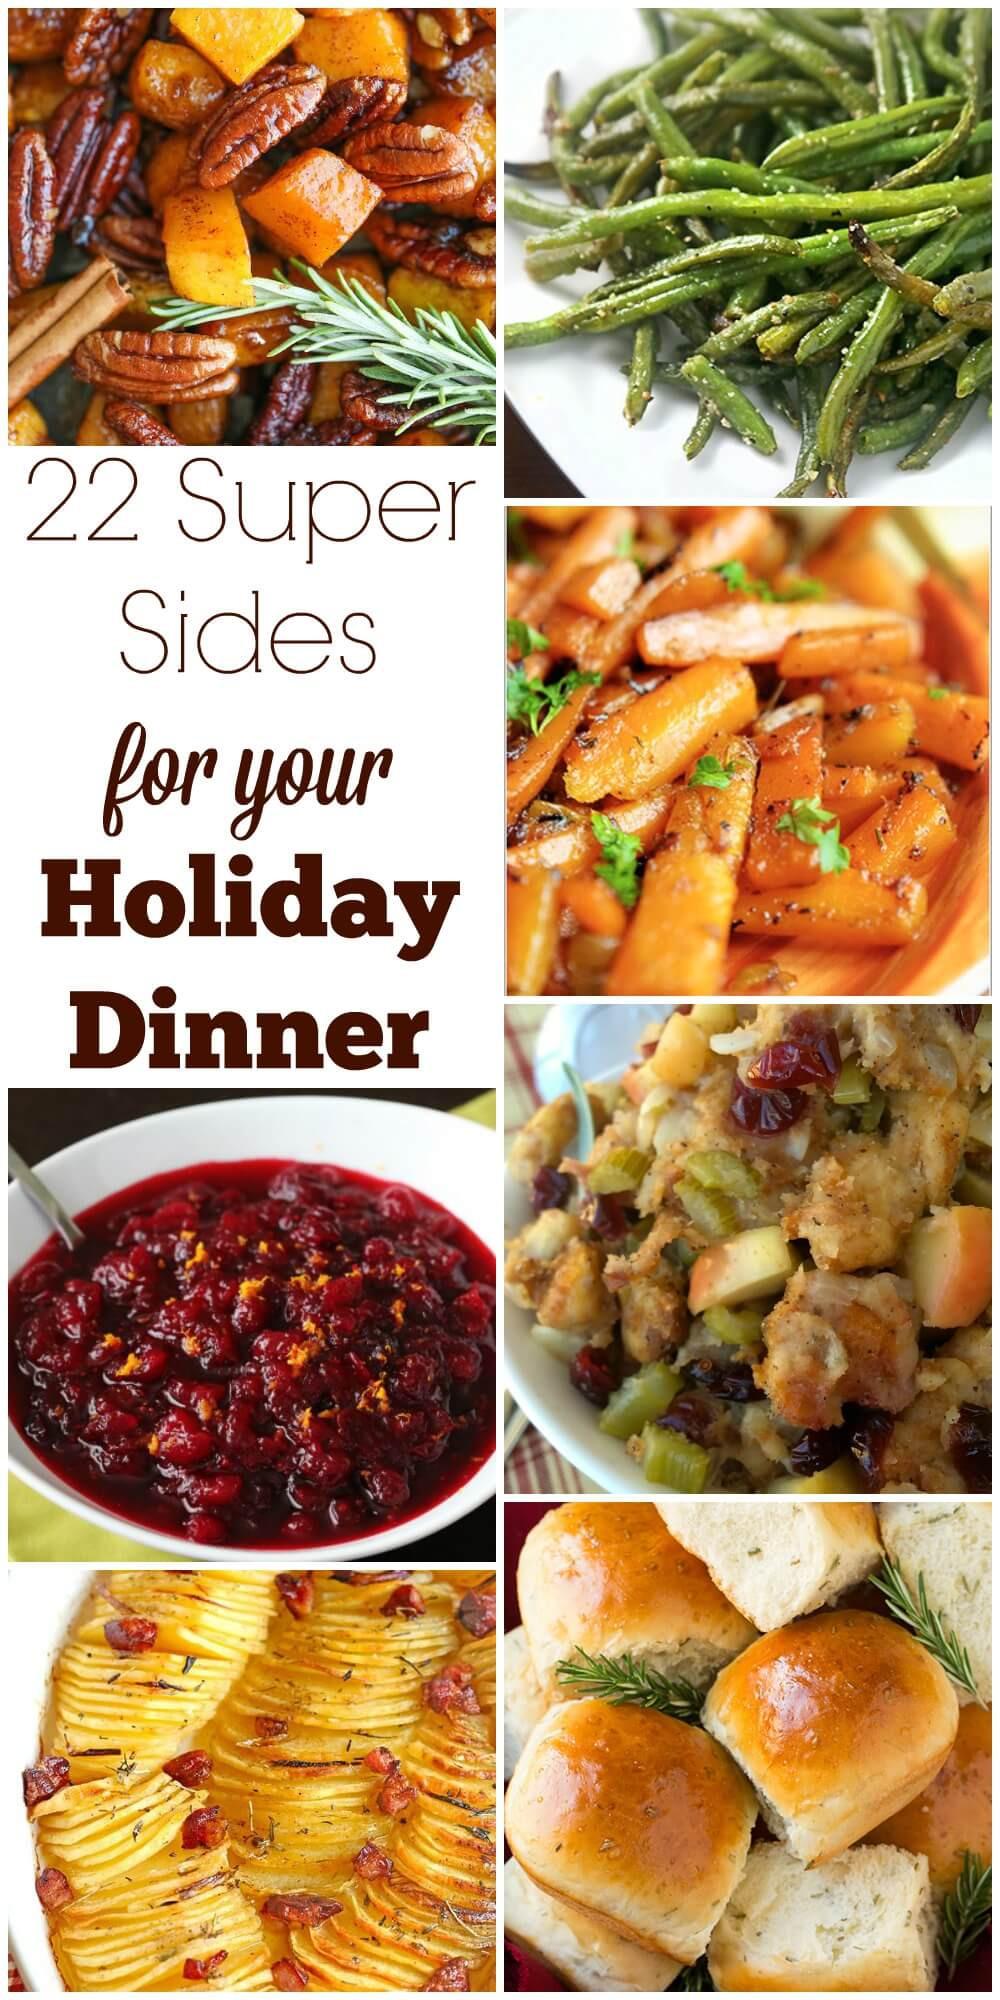 Thanksgiving Dinner Sides  22 Super Sides for Your Holiday Dinner